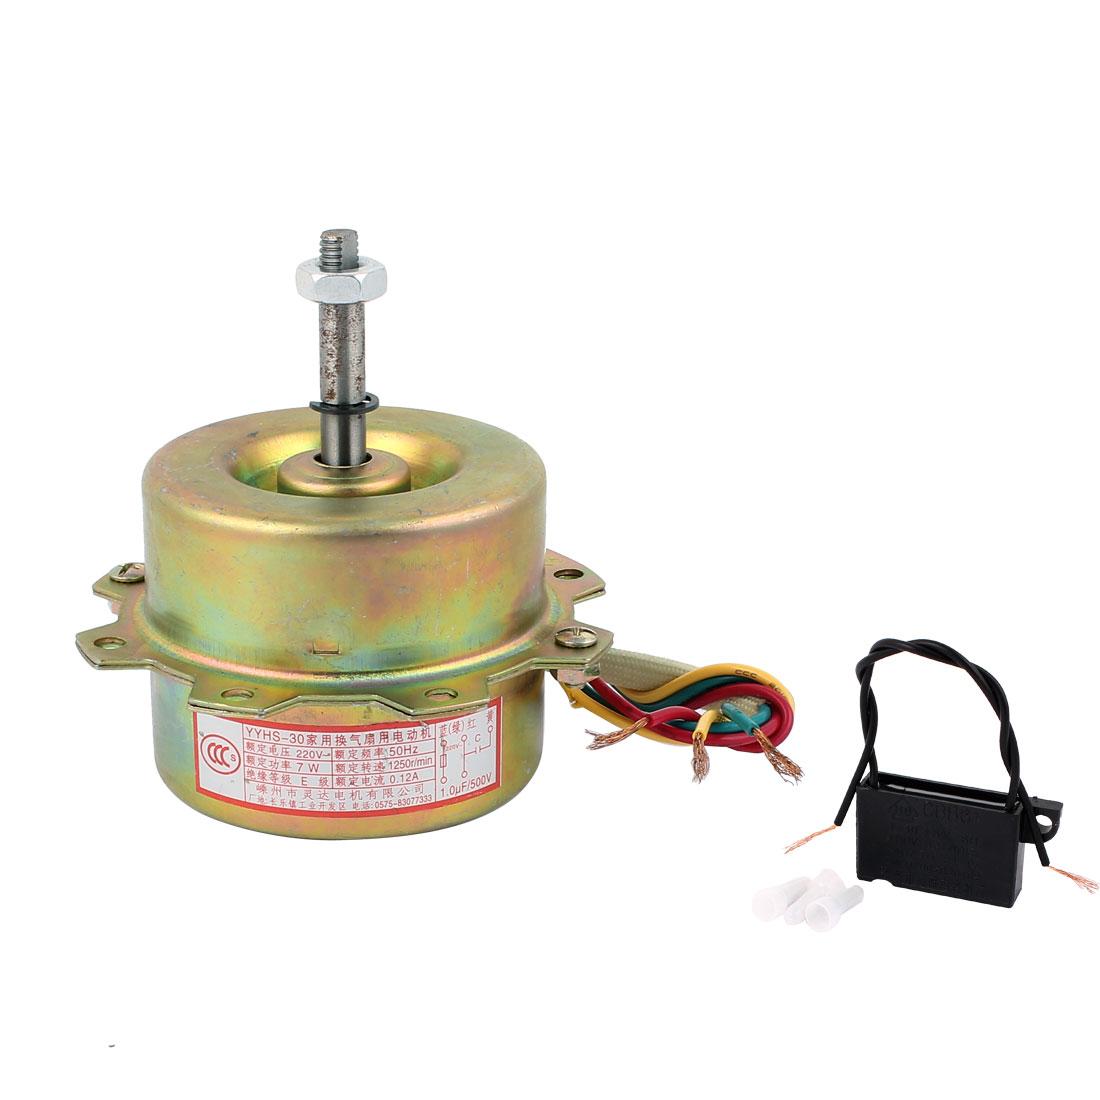 AC 220V 0.12A 7W 1250RPM 8mmx41mm Shaft Dual Bearing Ball Electric Ventilator Fan Motor